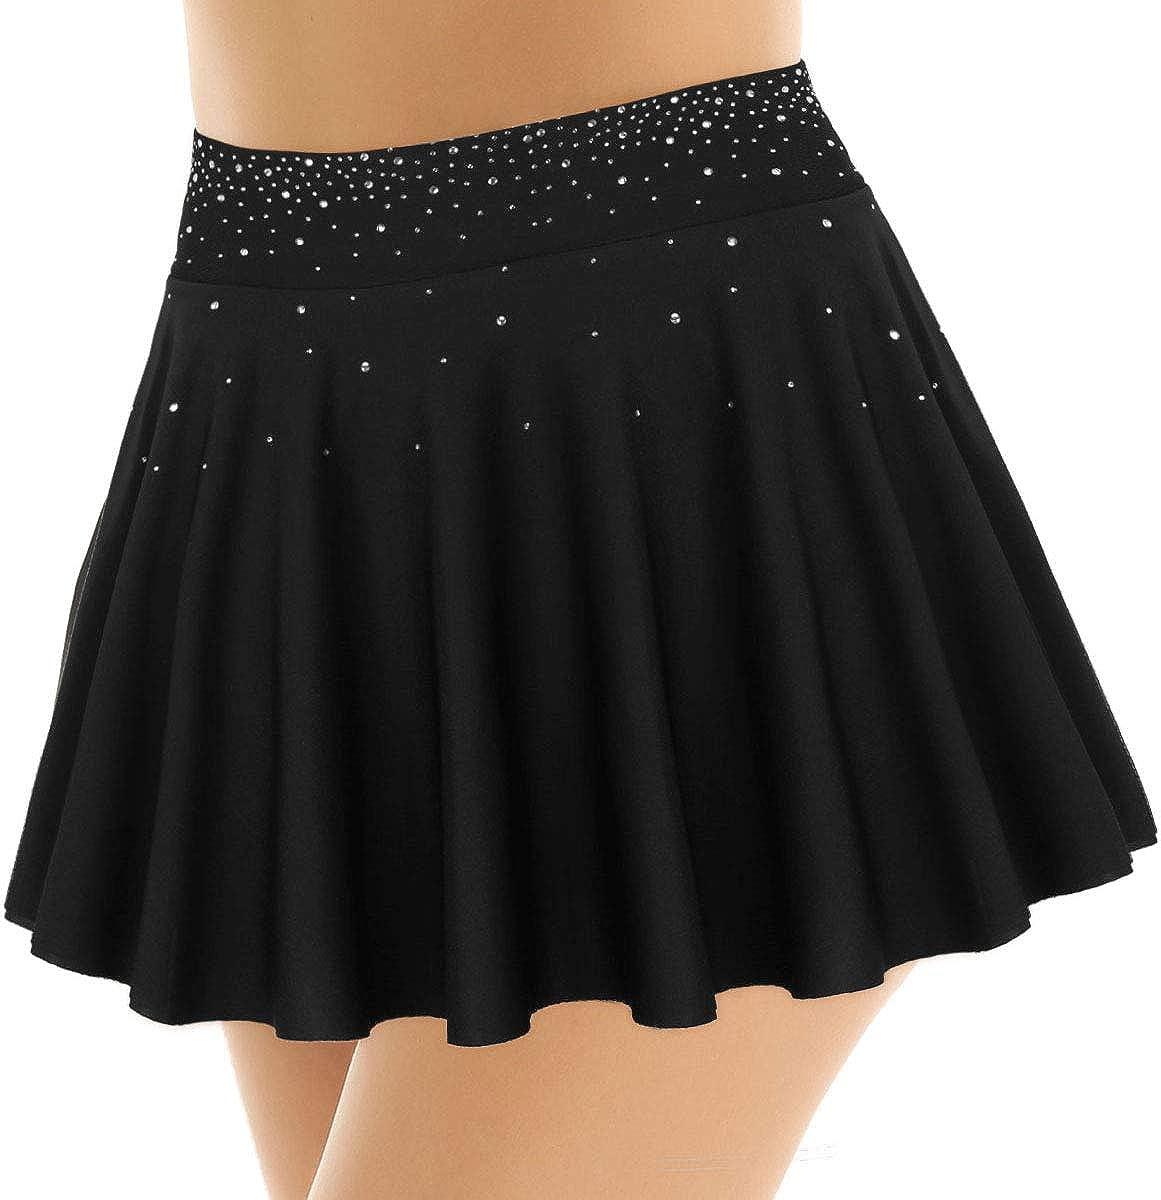 inlzdz Womens Shiny Rhinestone Short Pleated Skirt Gymnastics Ballet Dance Figure Ice Skating Skirt with Built-in Briefs